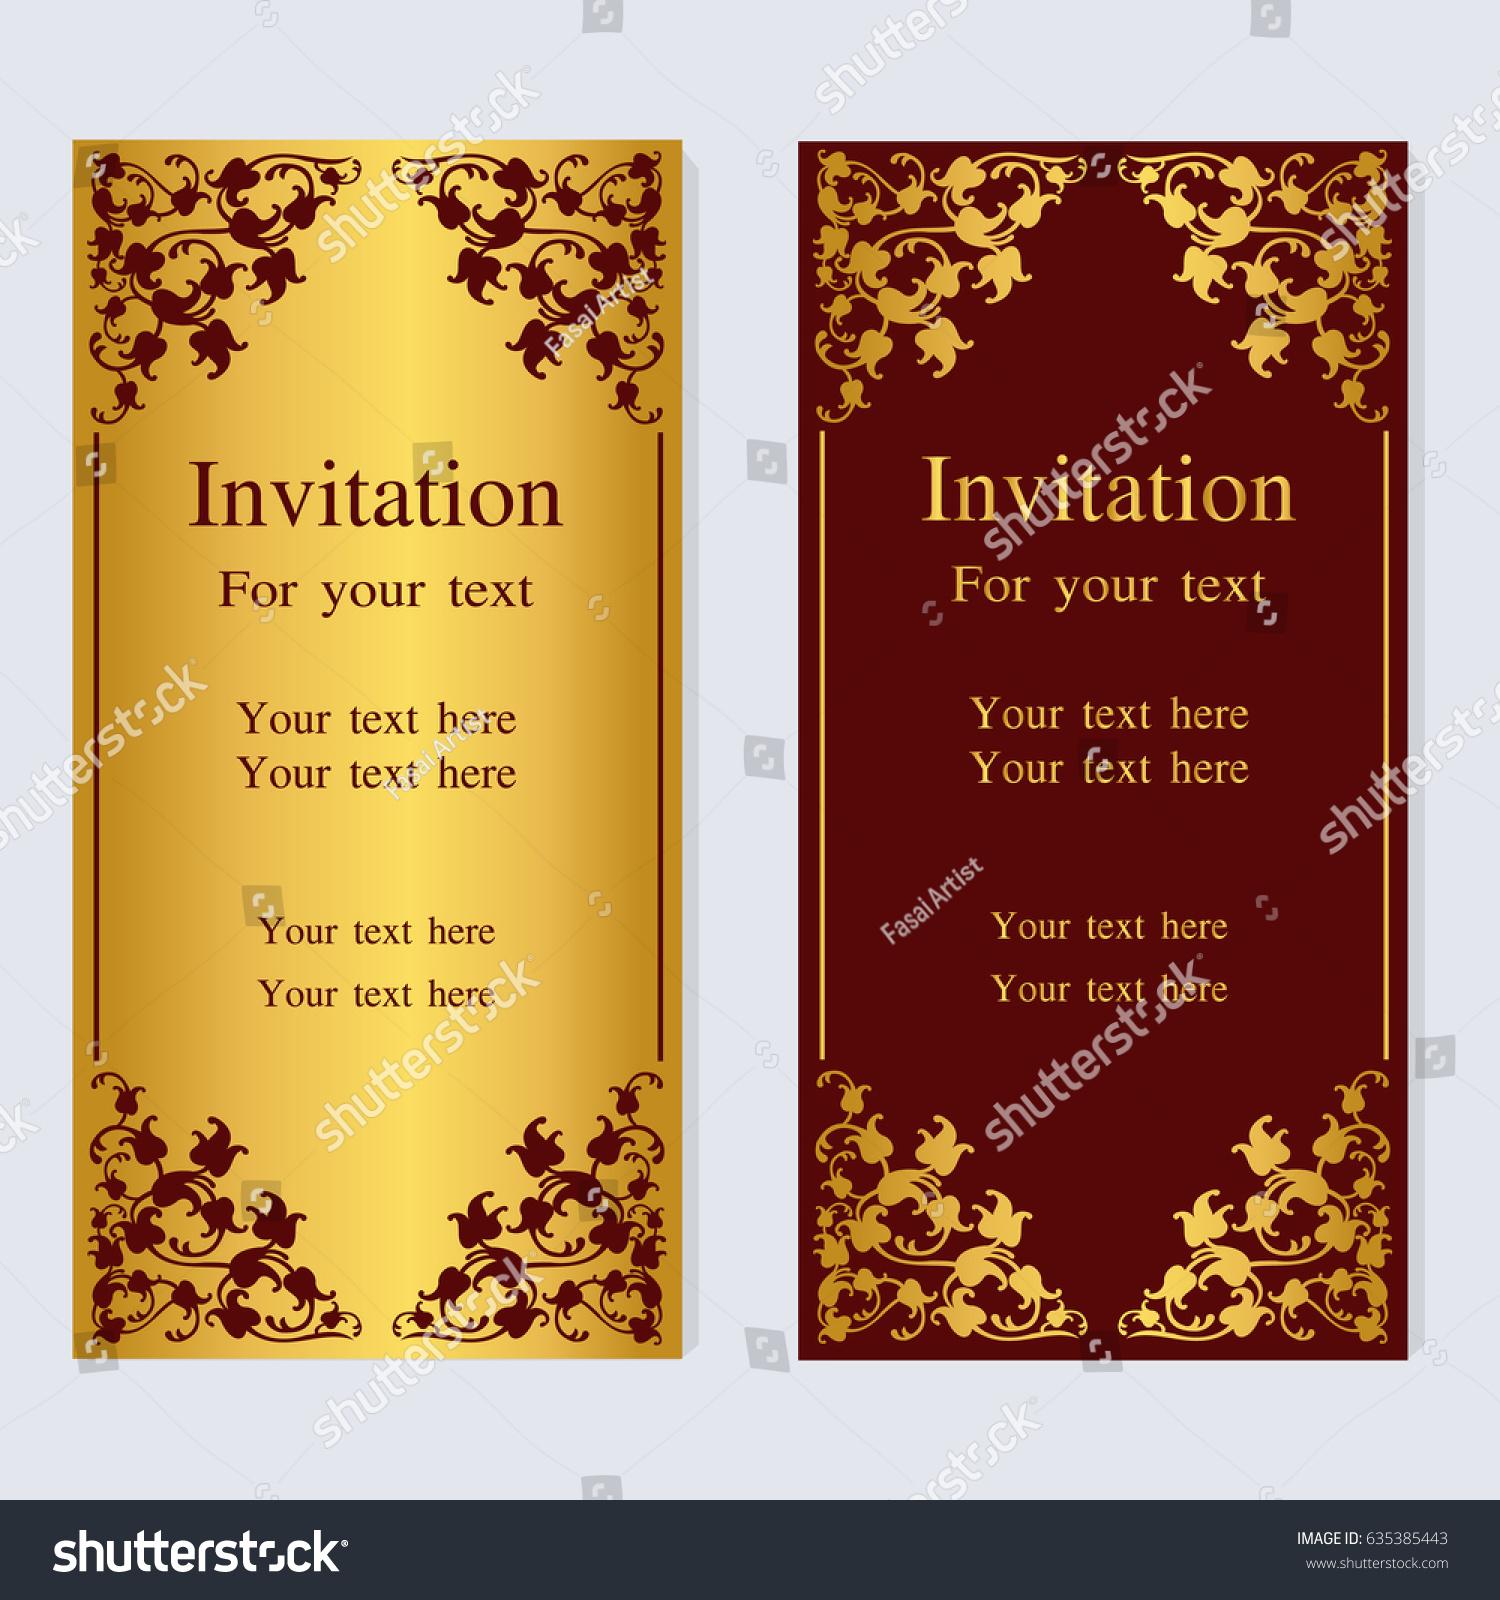 Vintage Invitation Wedding Cards Stock Vector (Royalty Free ...